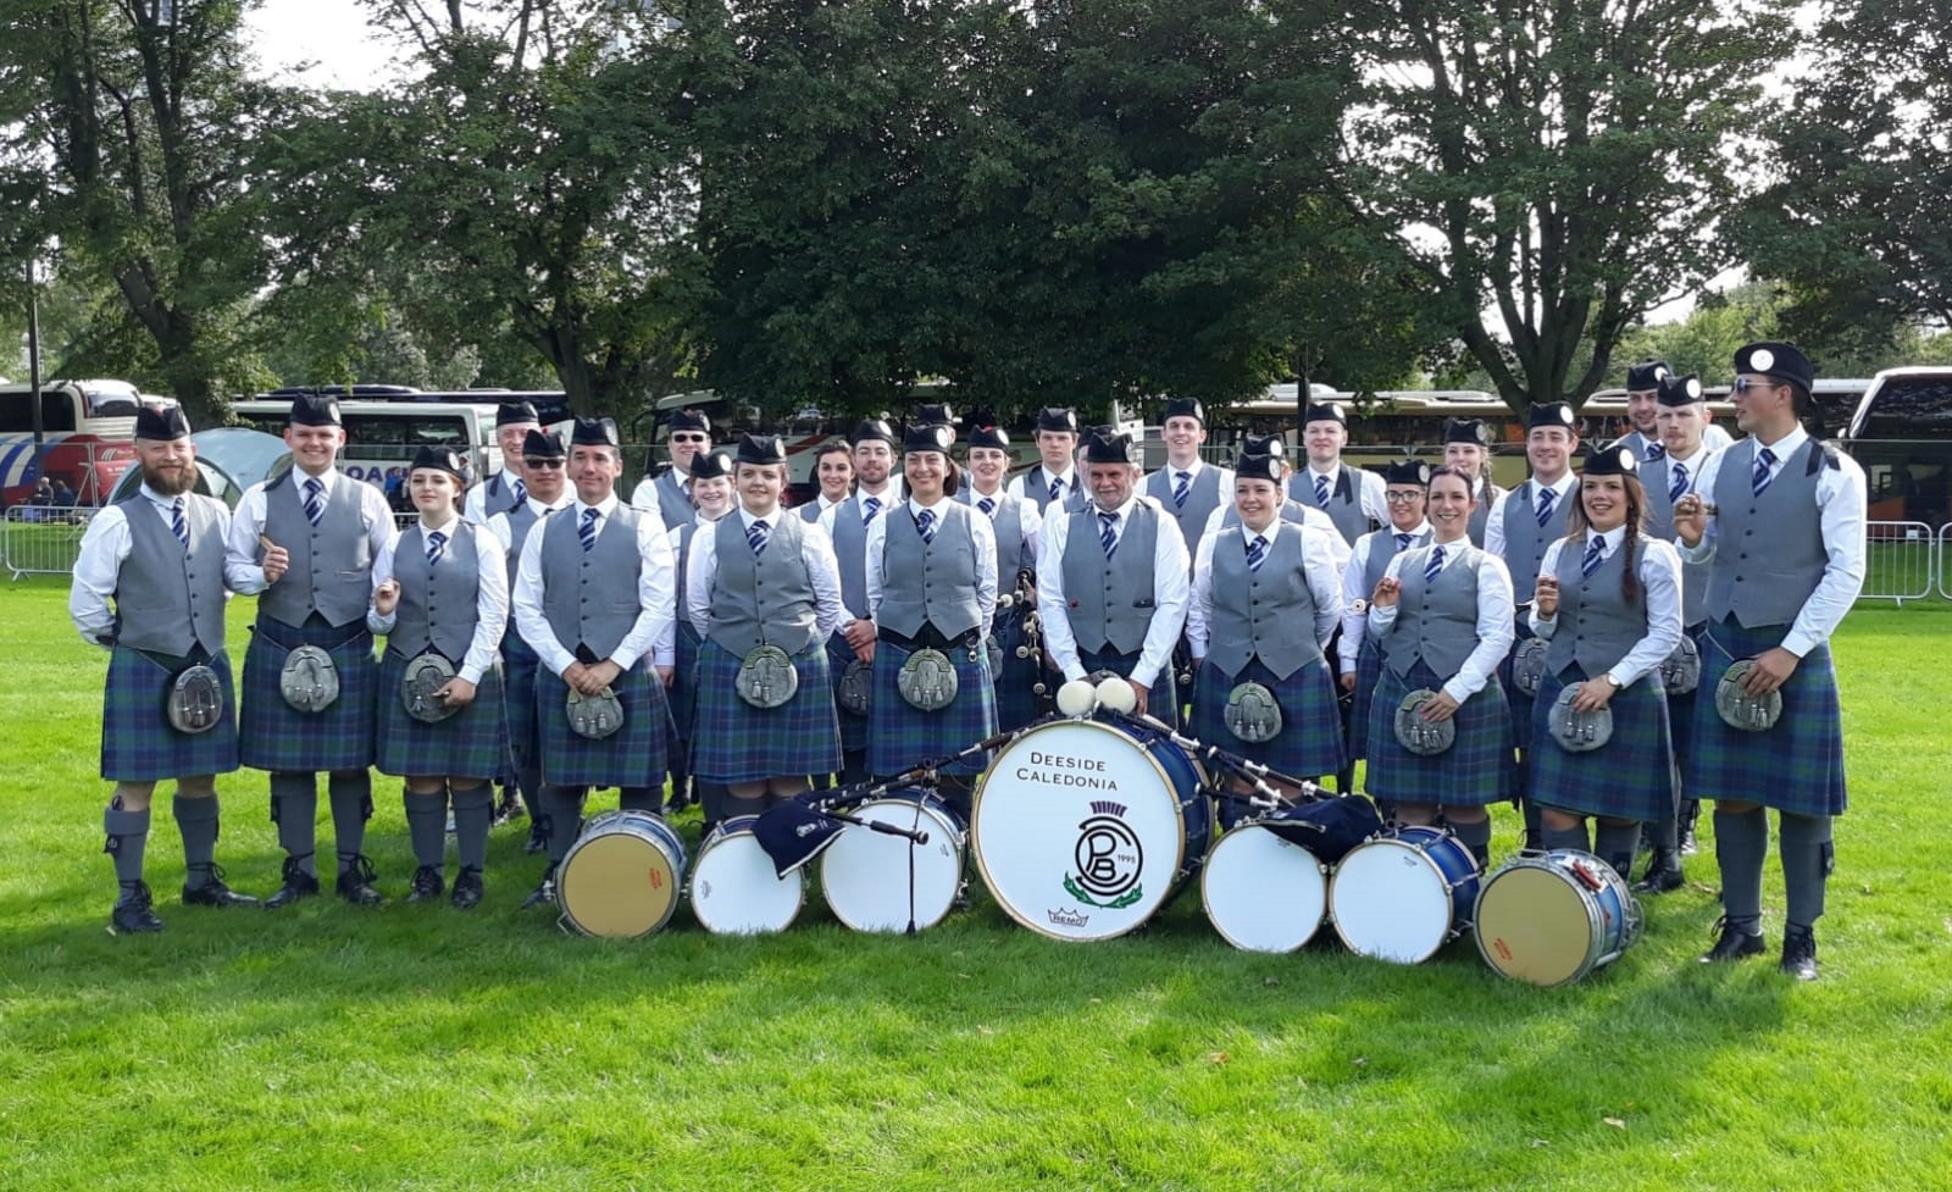 The Deeside Caledonia Pipe Band